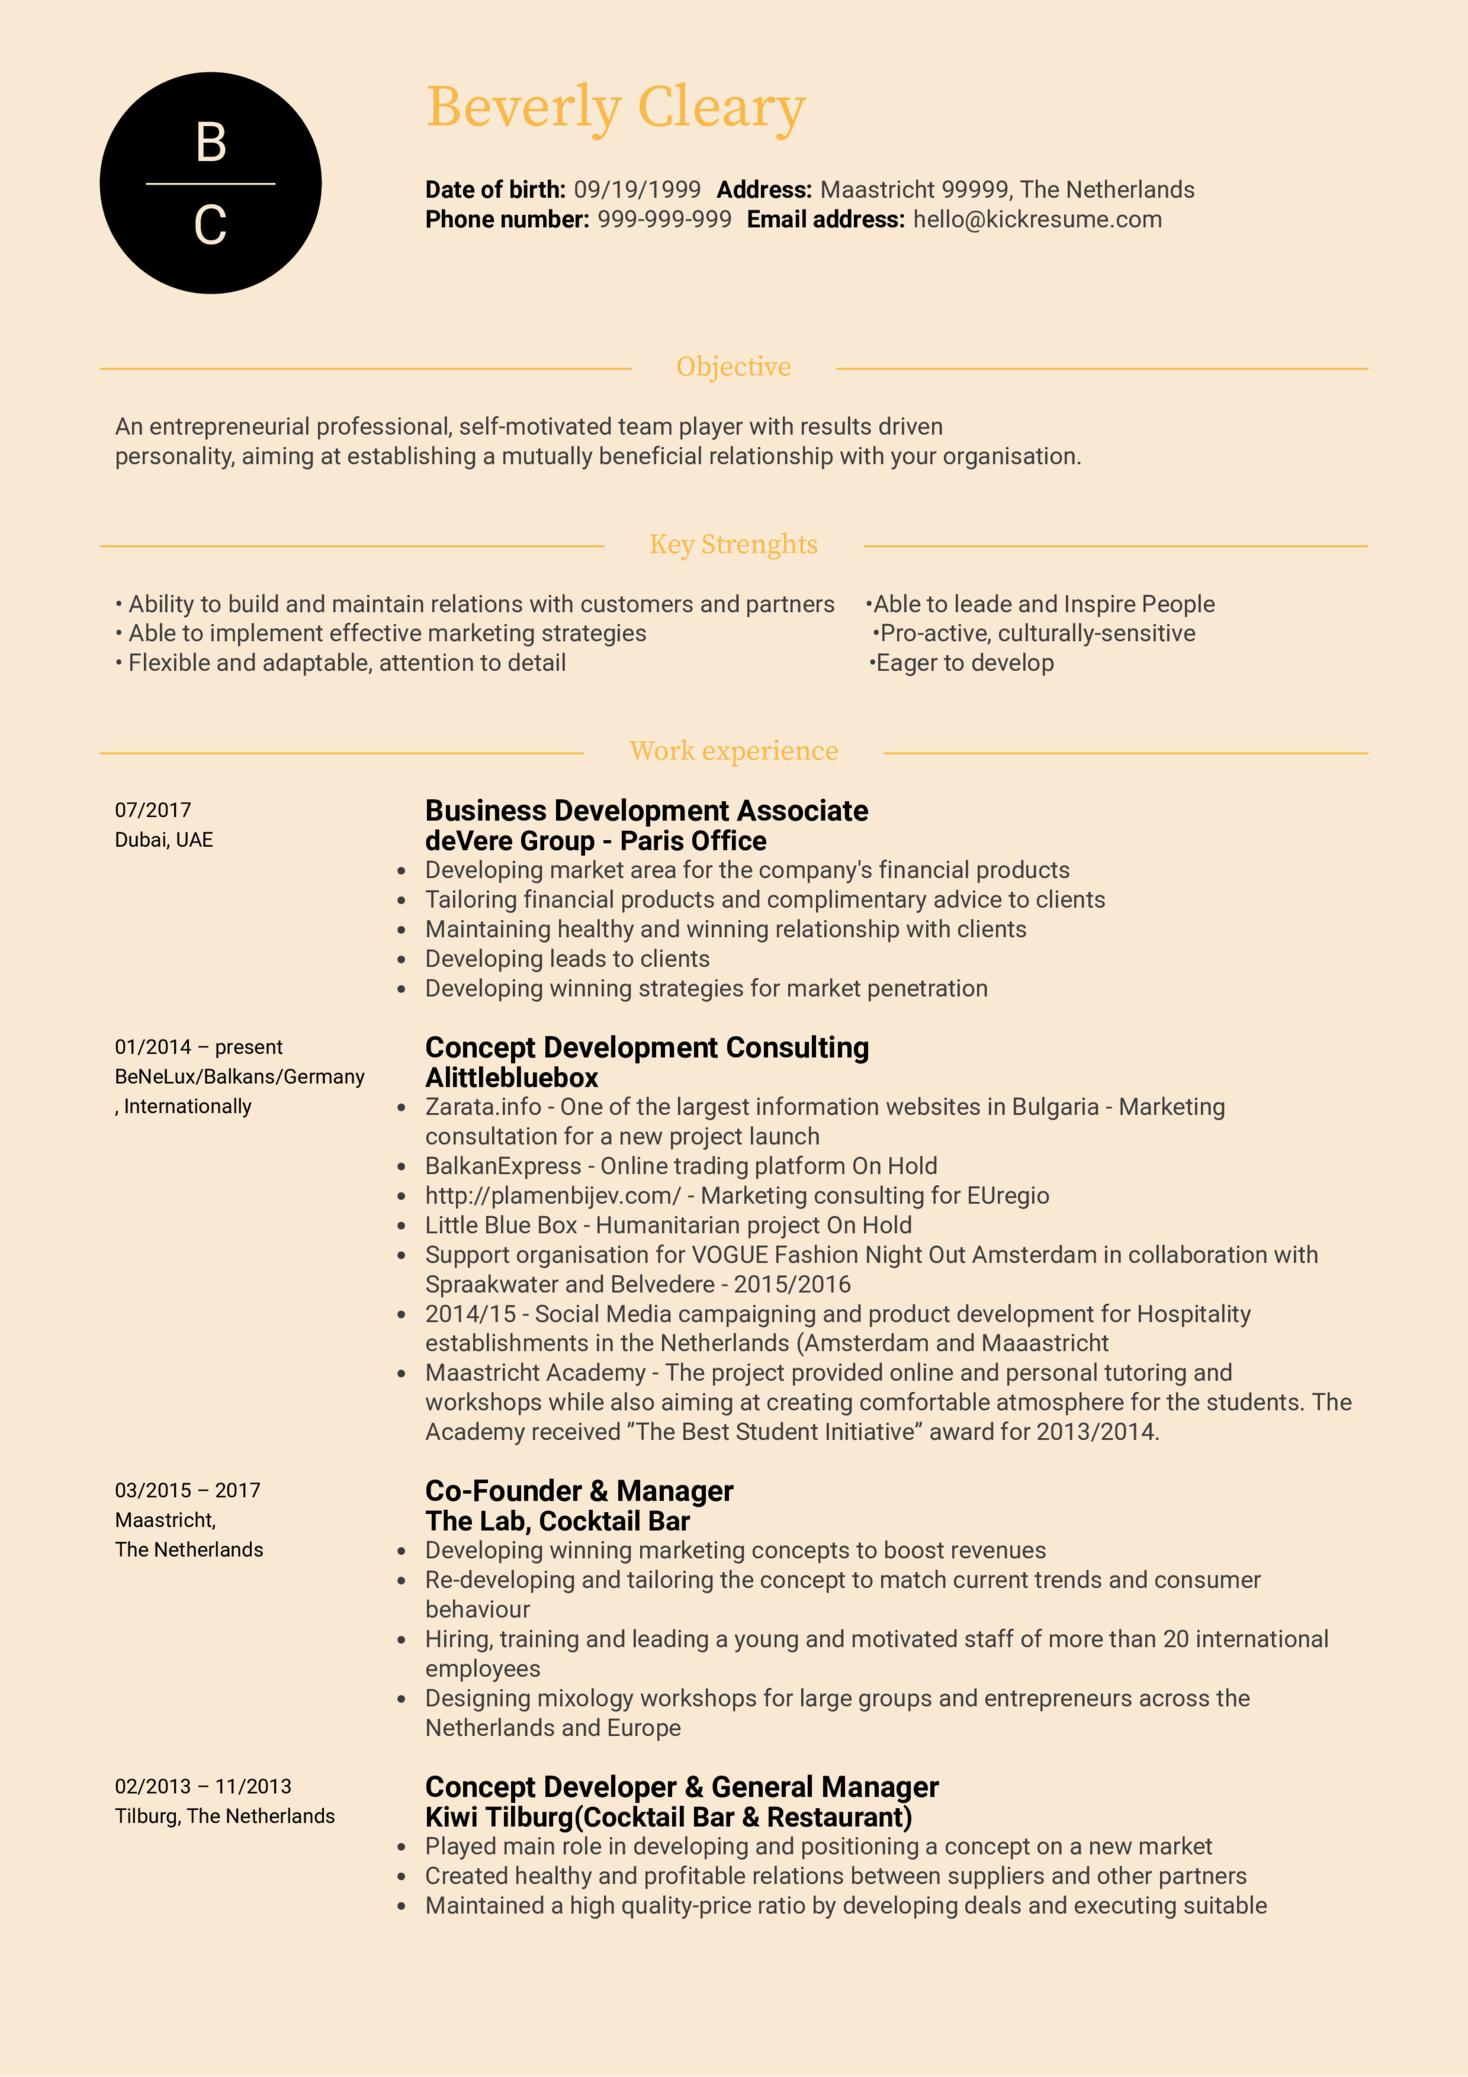 Marketing Manager Resume Sample (Part 1)